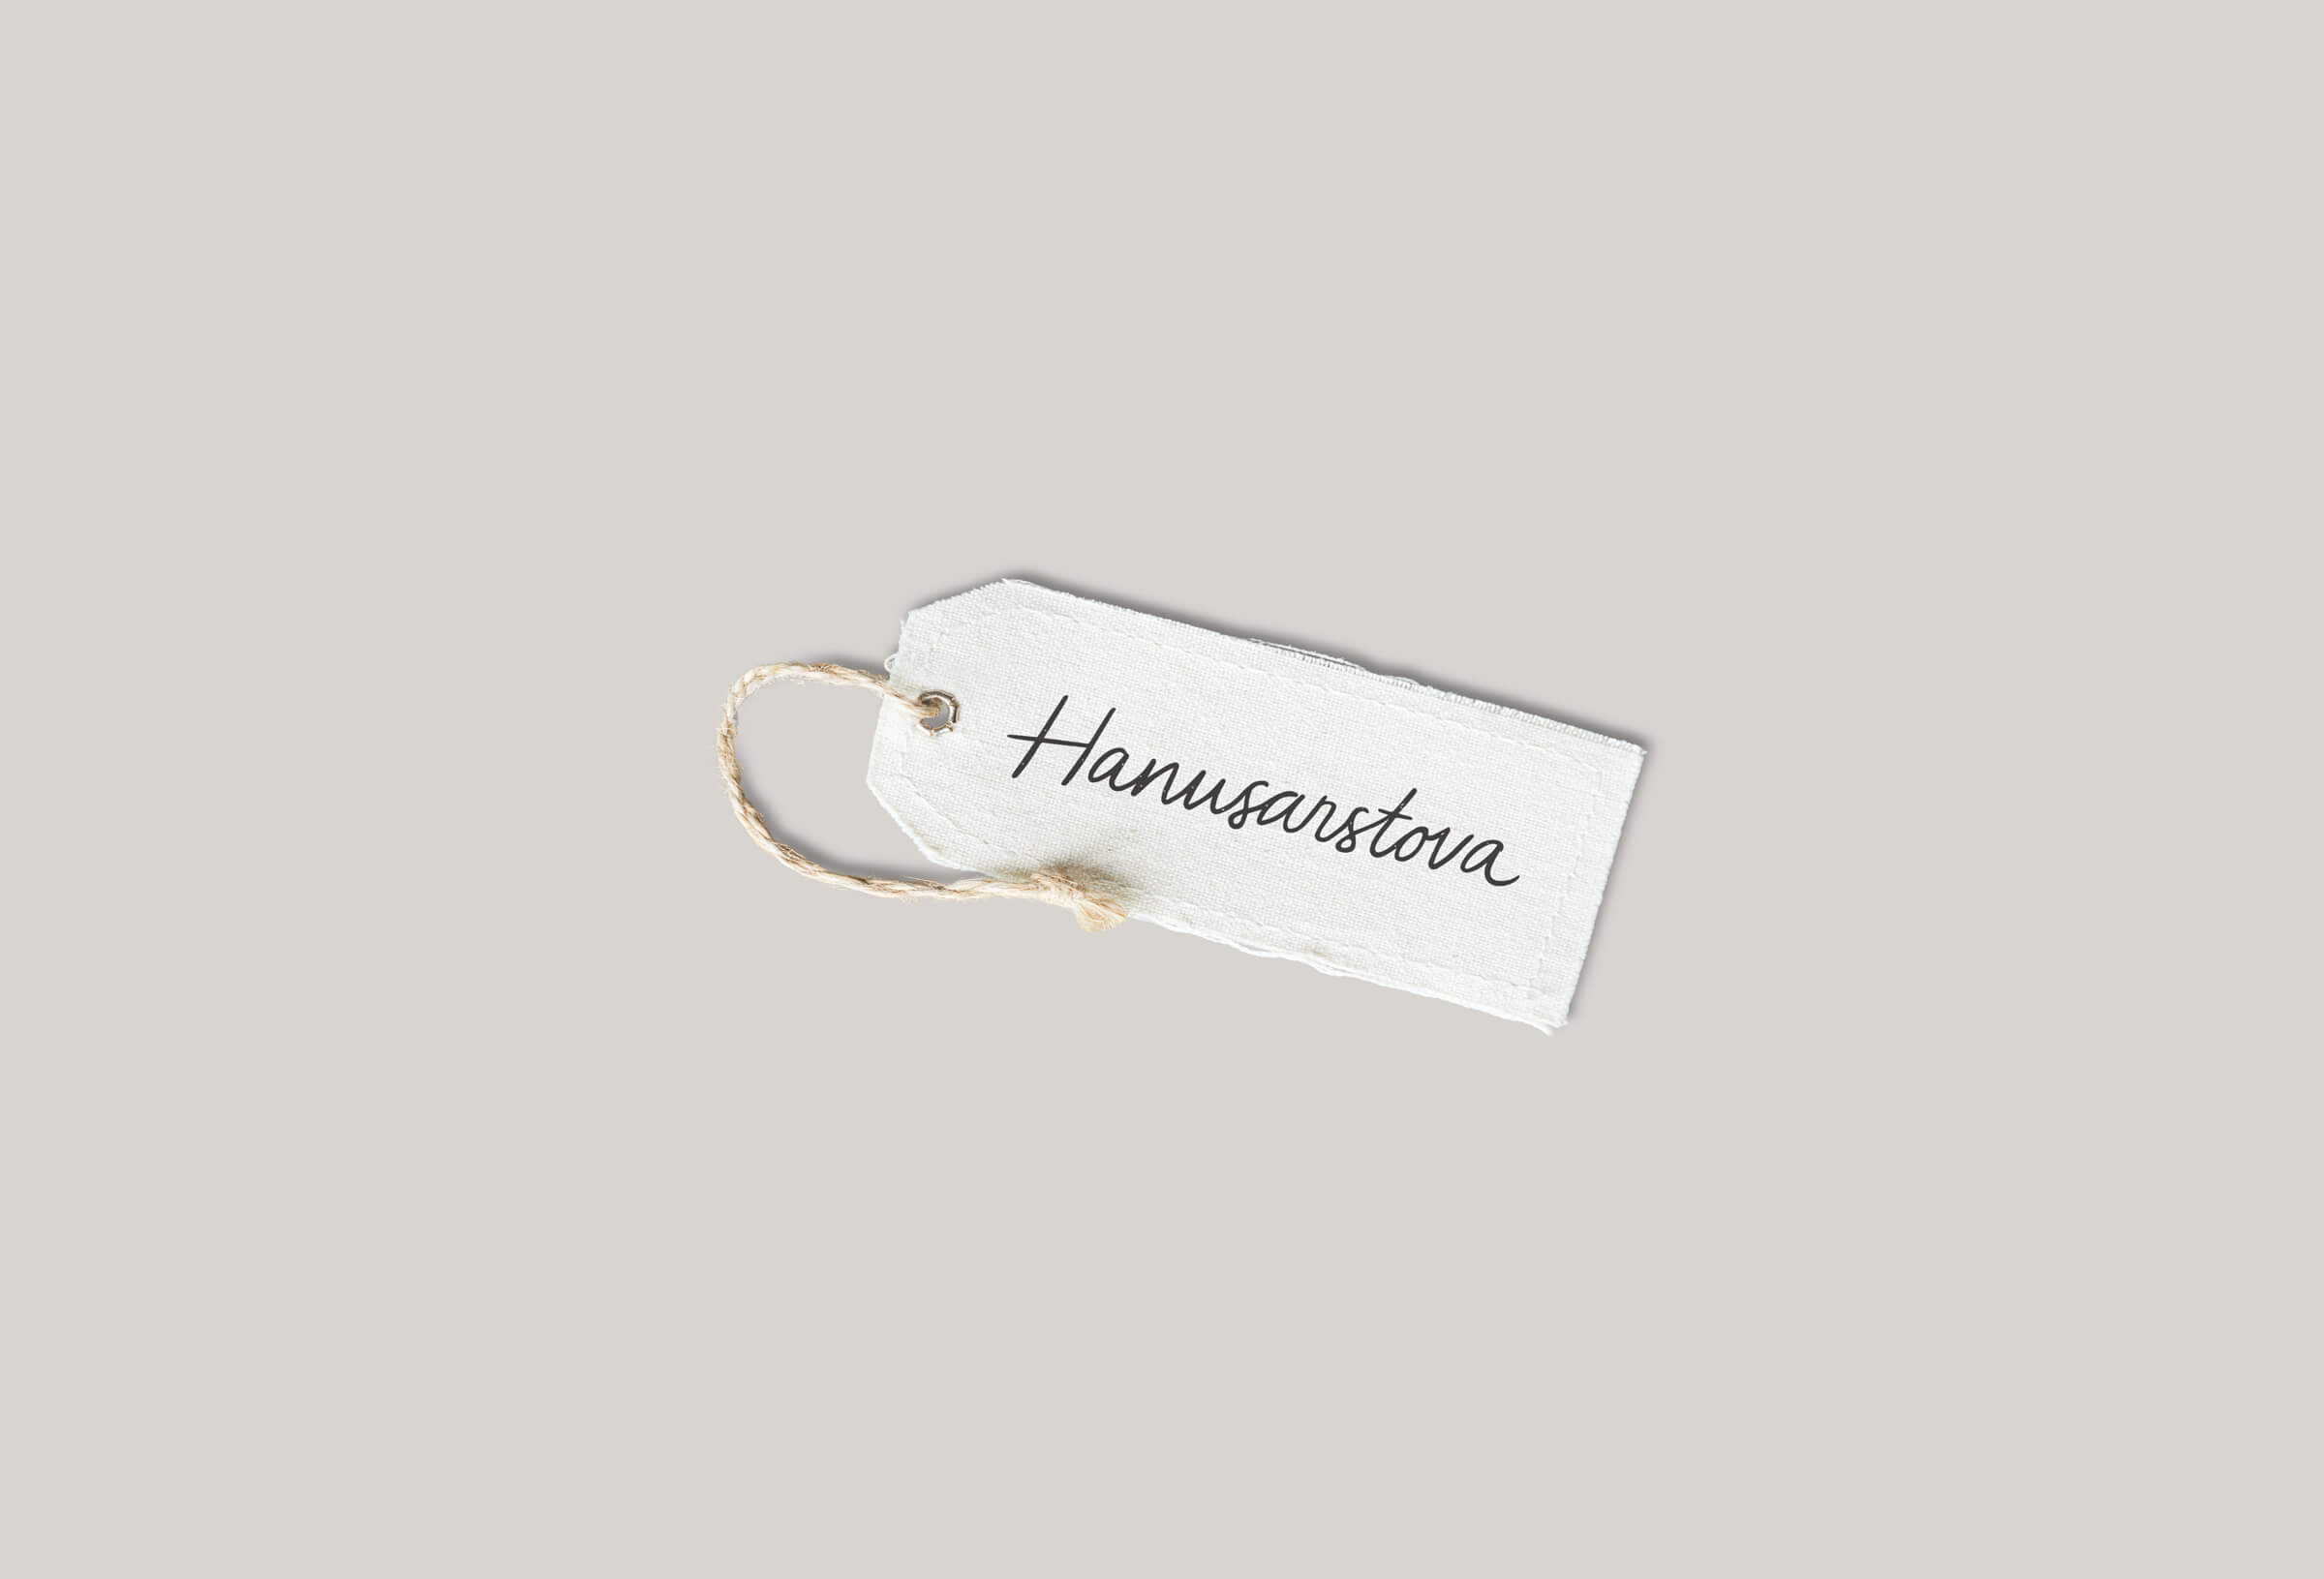 Hanusarstova clothing tag